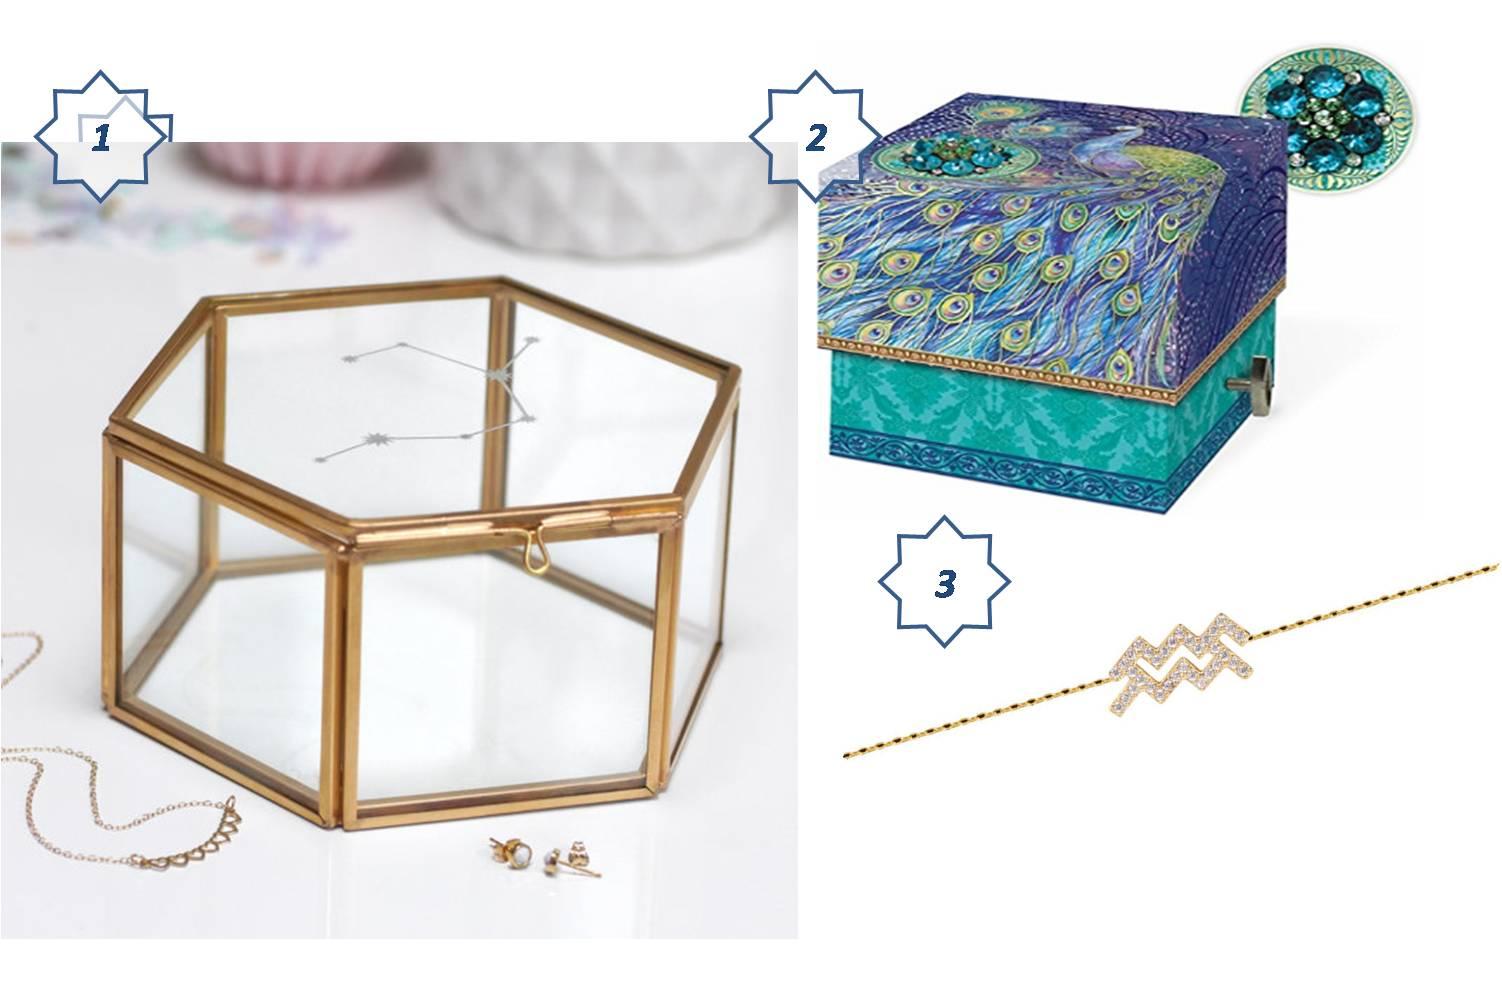 Aquarius woman gift ideas